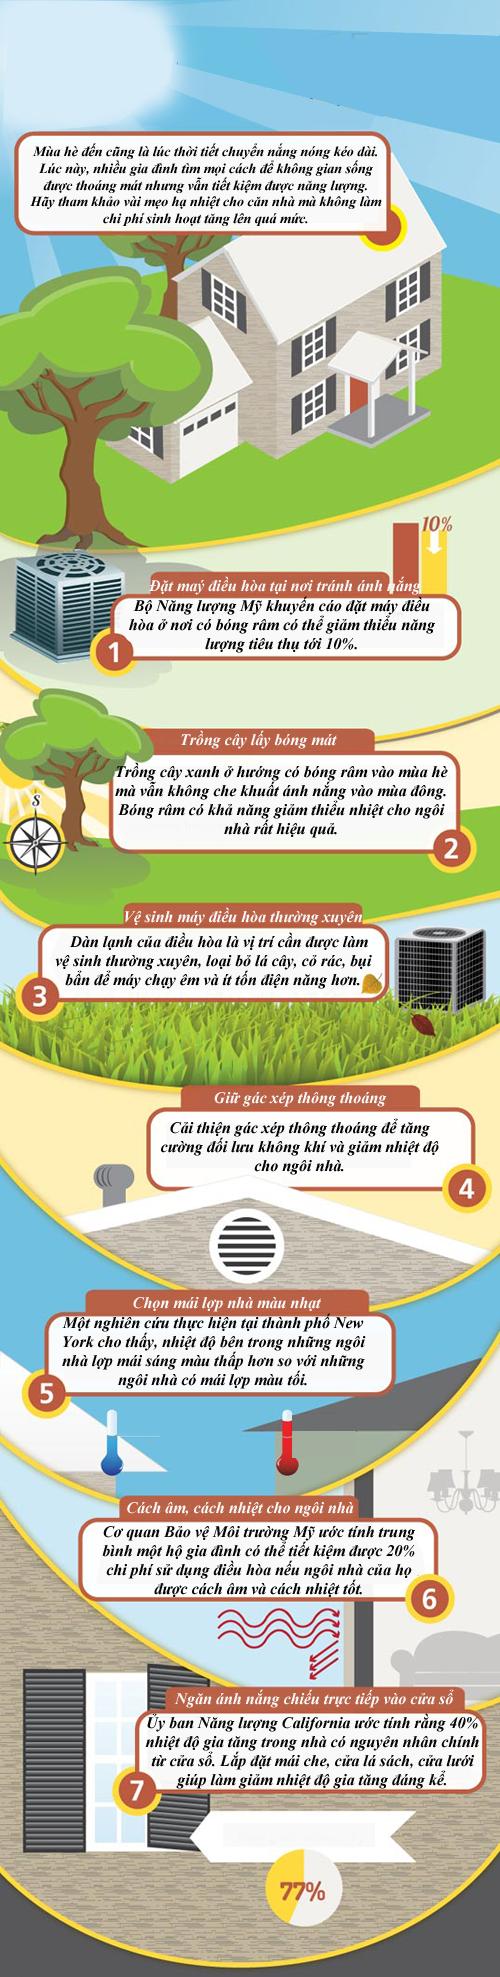 beat-the-heat-infographic-copy-2339-2049